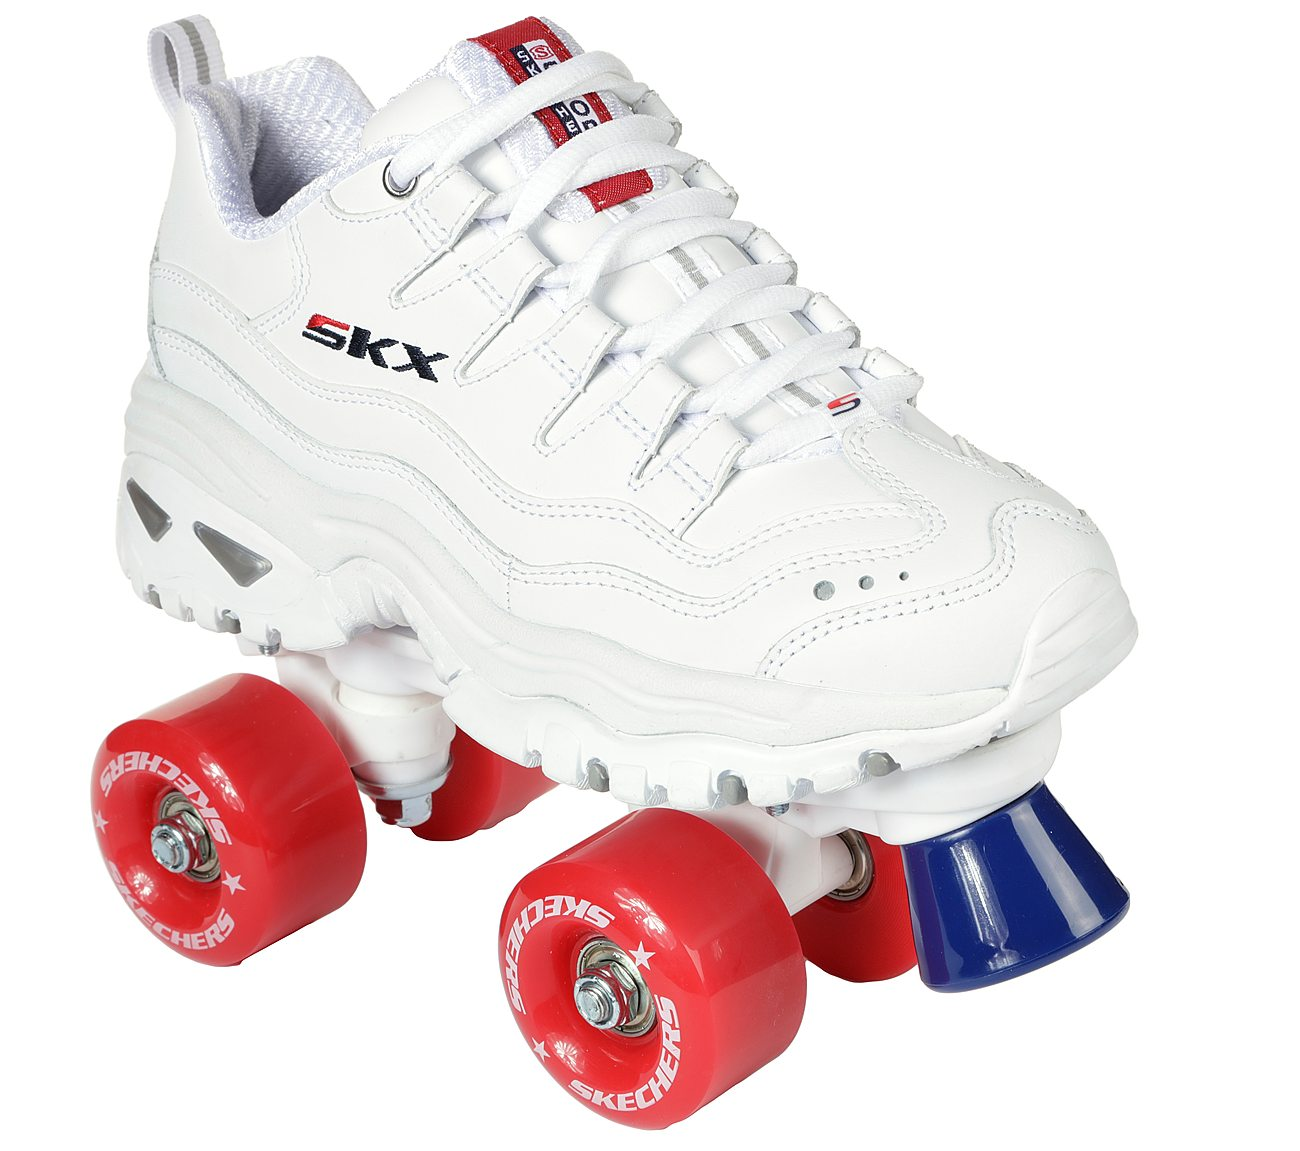 SKECHERS Energy - 4 Wheelers Sport Shoes